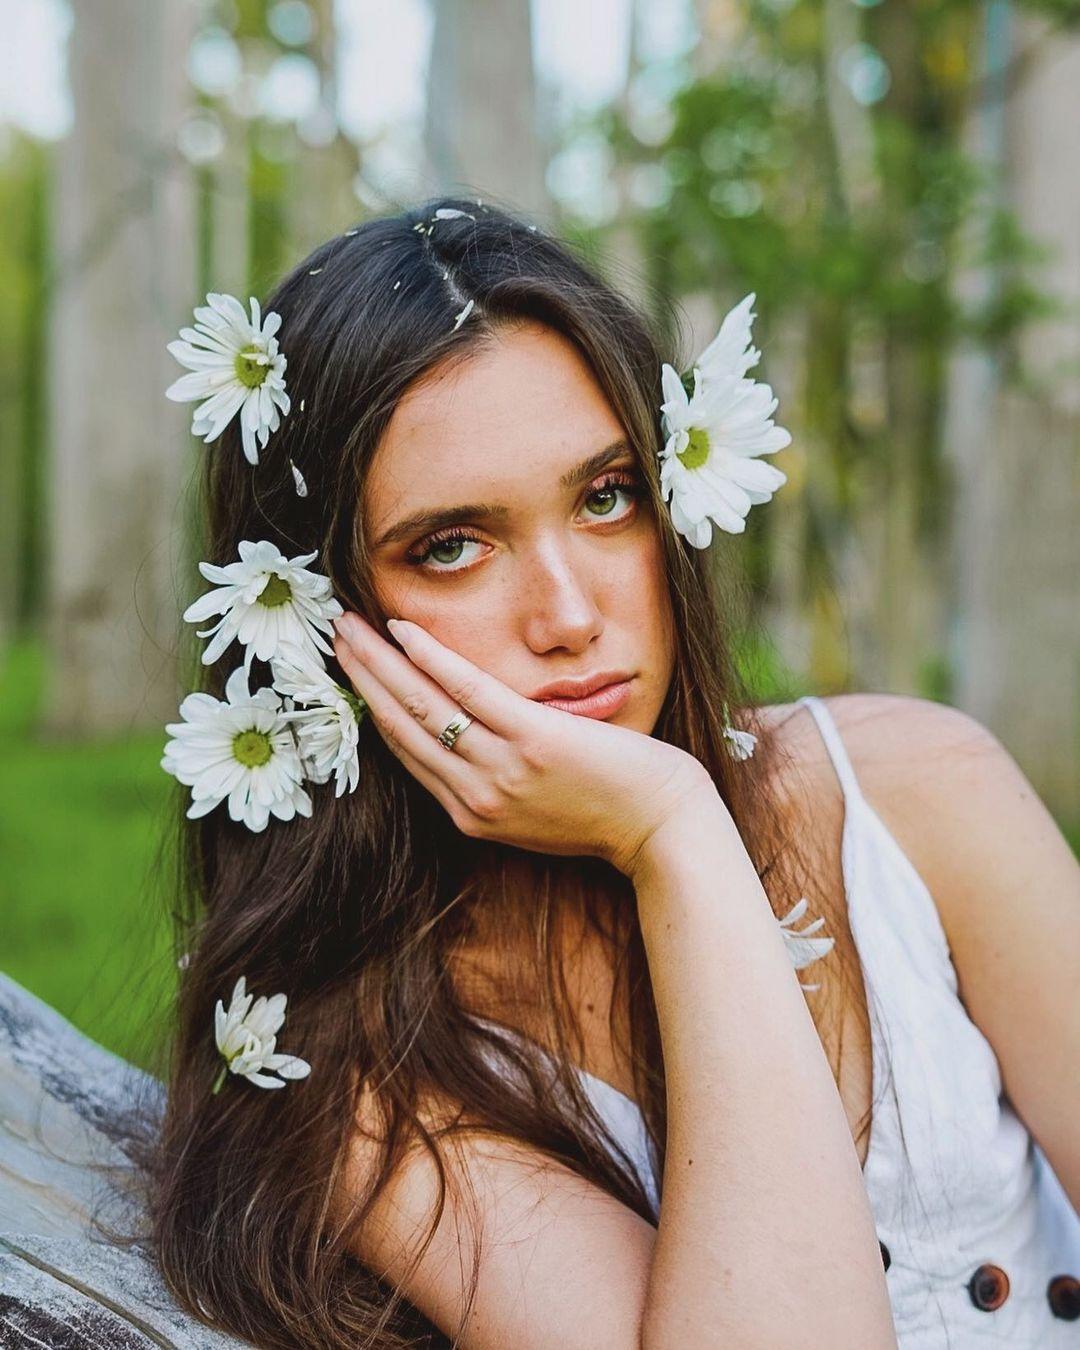 Hannah-Meloche-Wallpapers-Insta-Fit-Bio-6